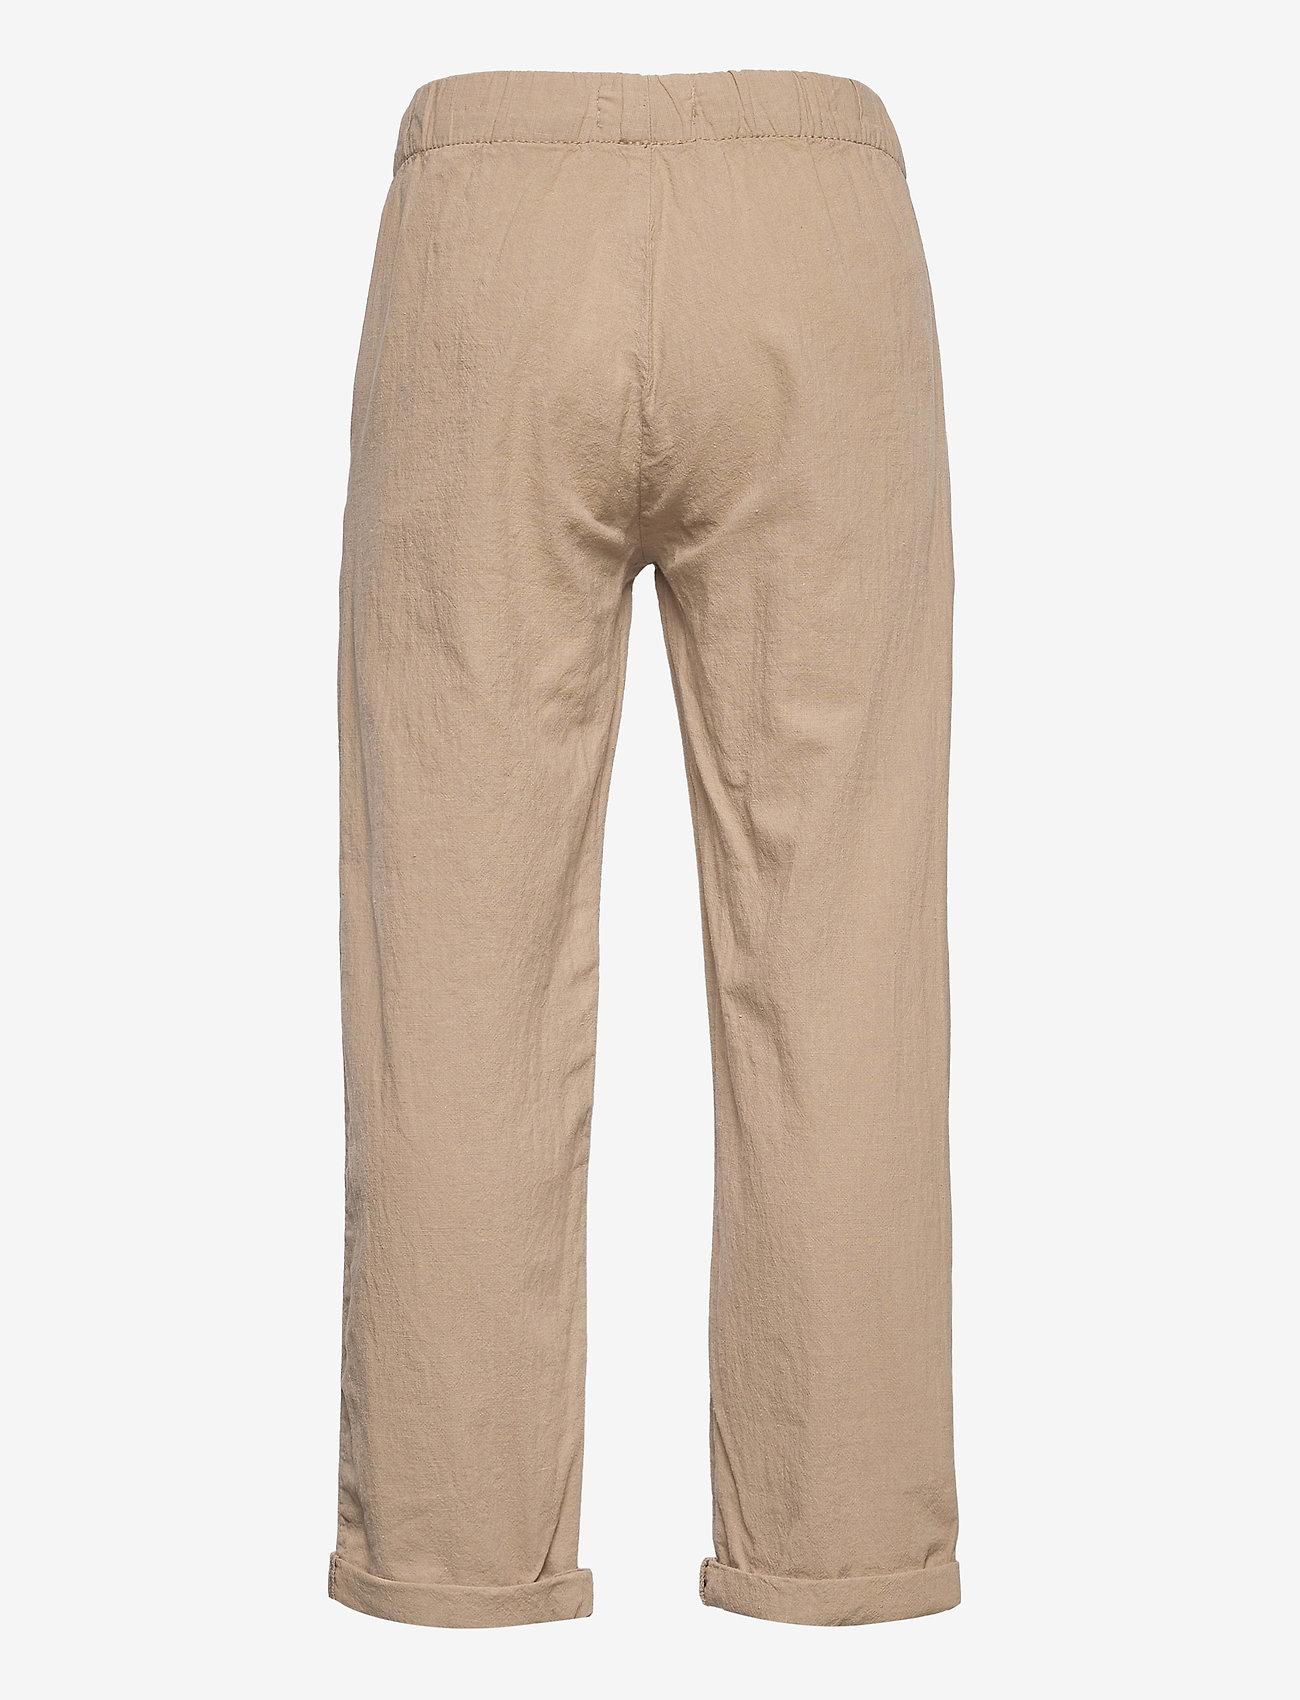 Lindex - Trousers Linnen - trousers - beige - 1